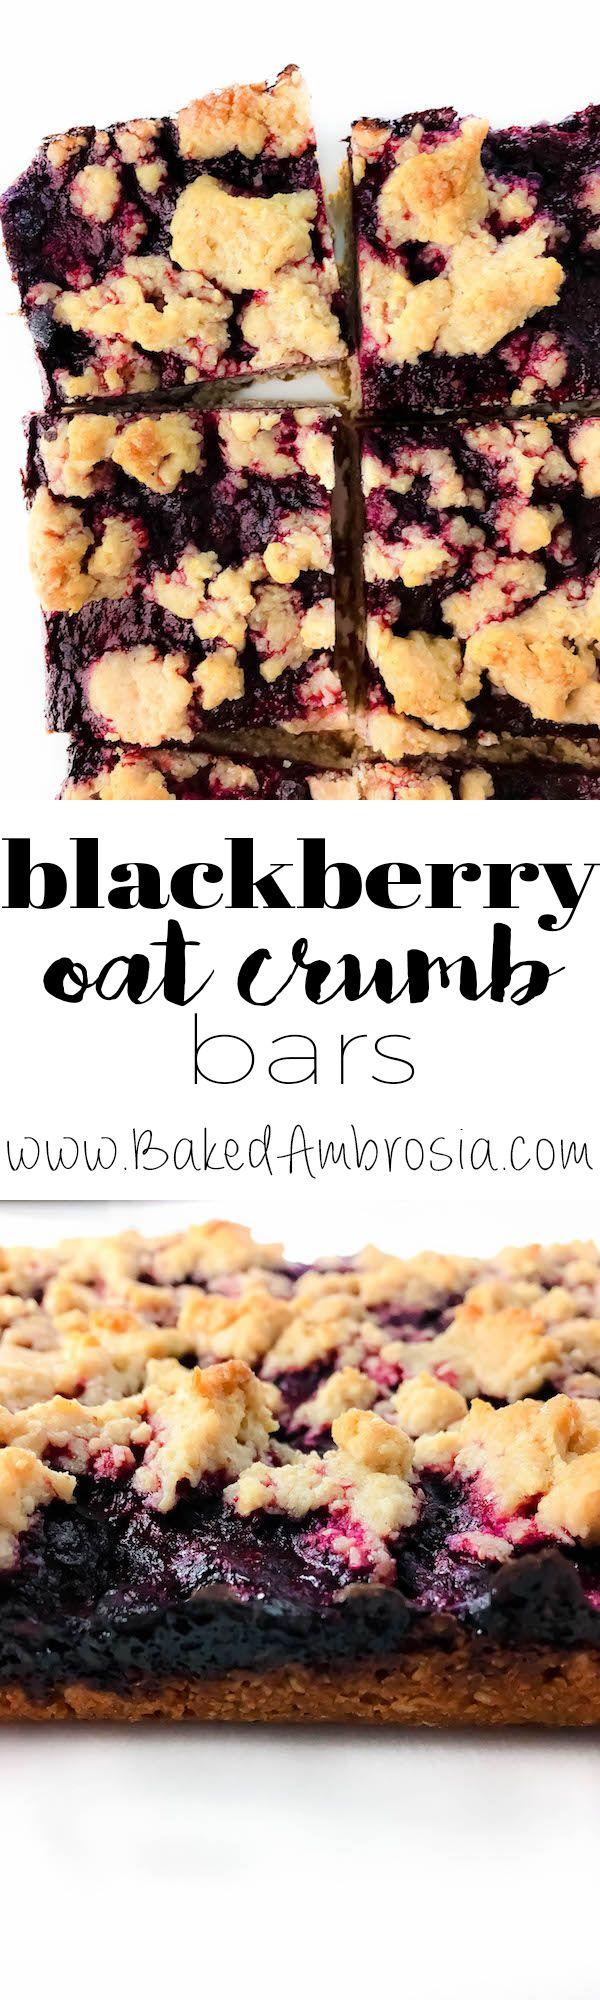 Blackberry Oat Crumb Bars (Gluten Free   Vegan)